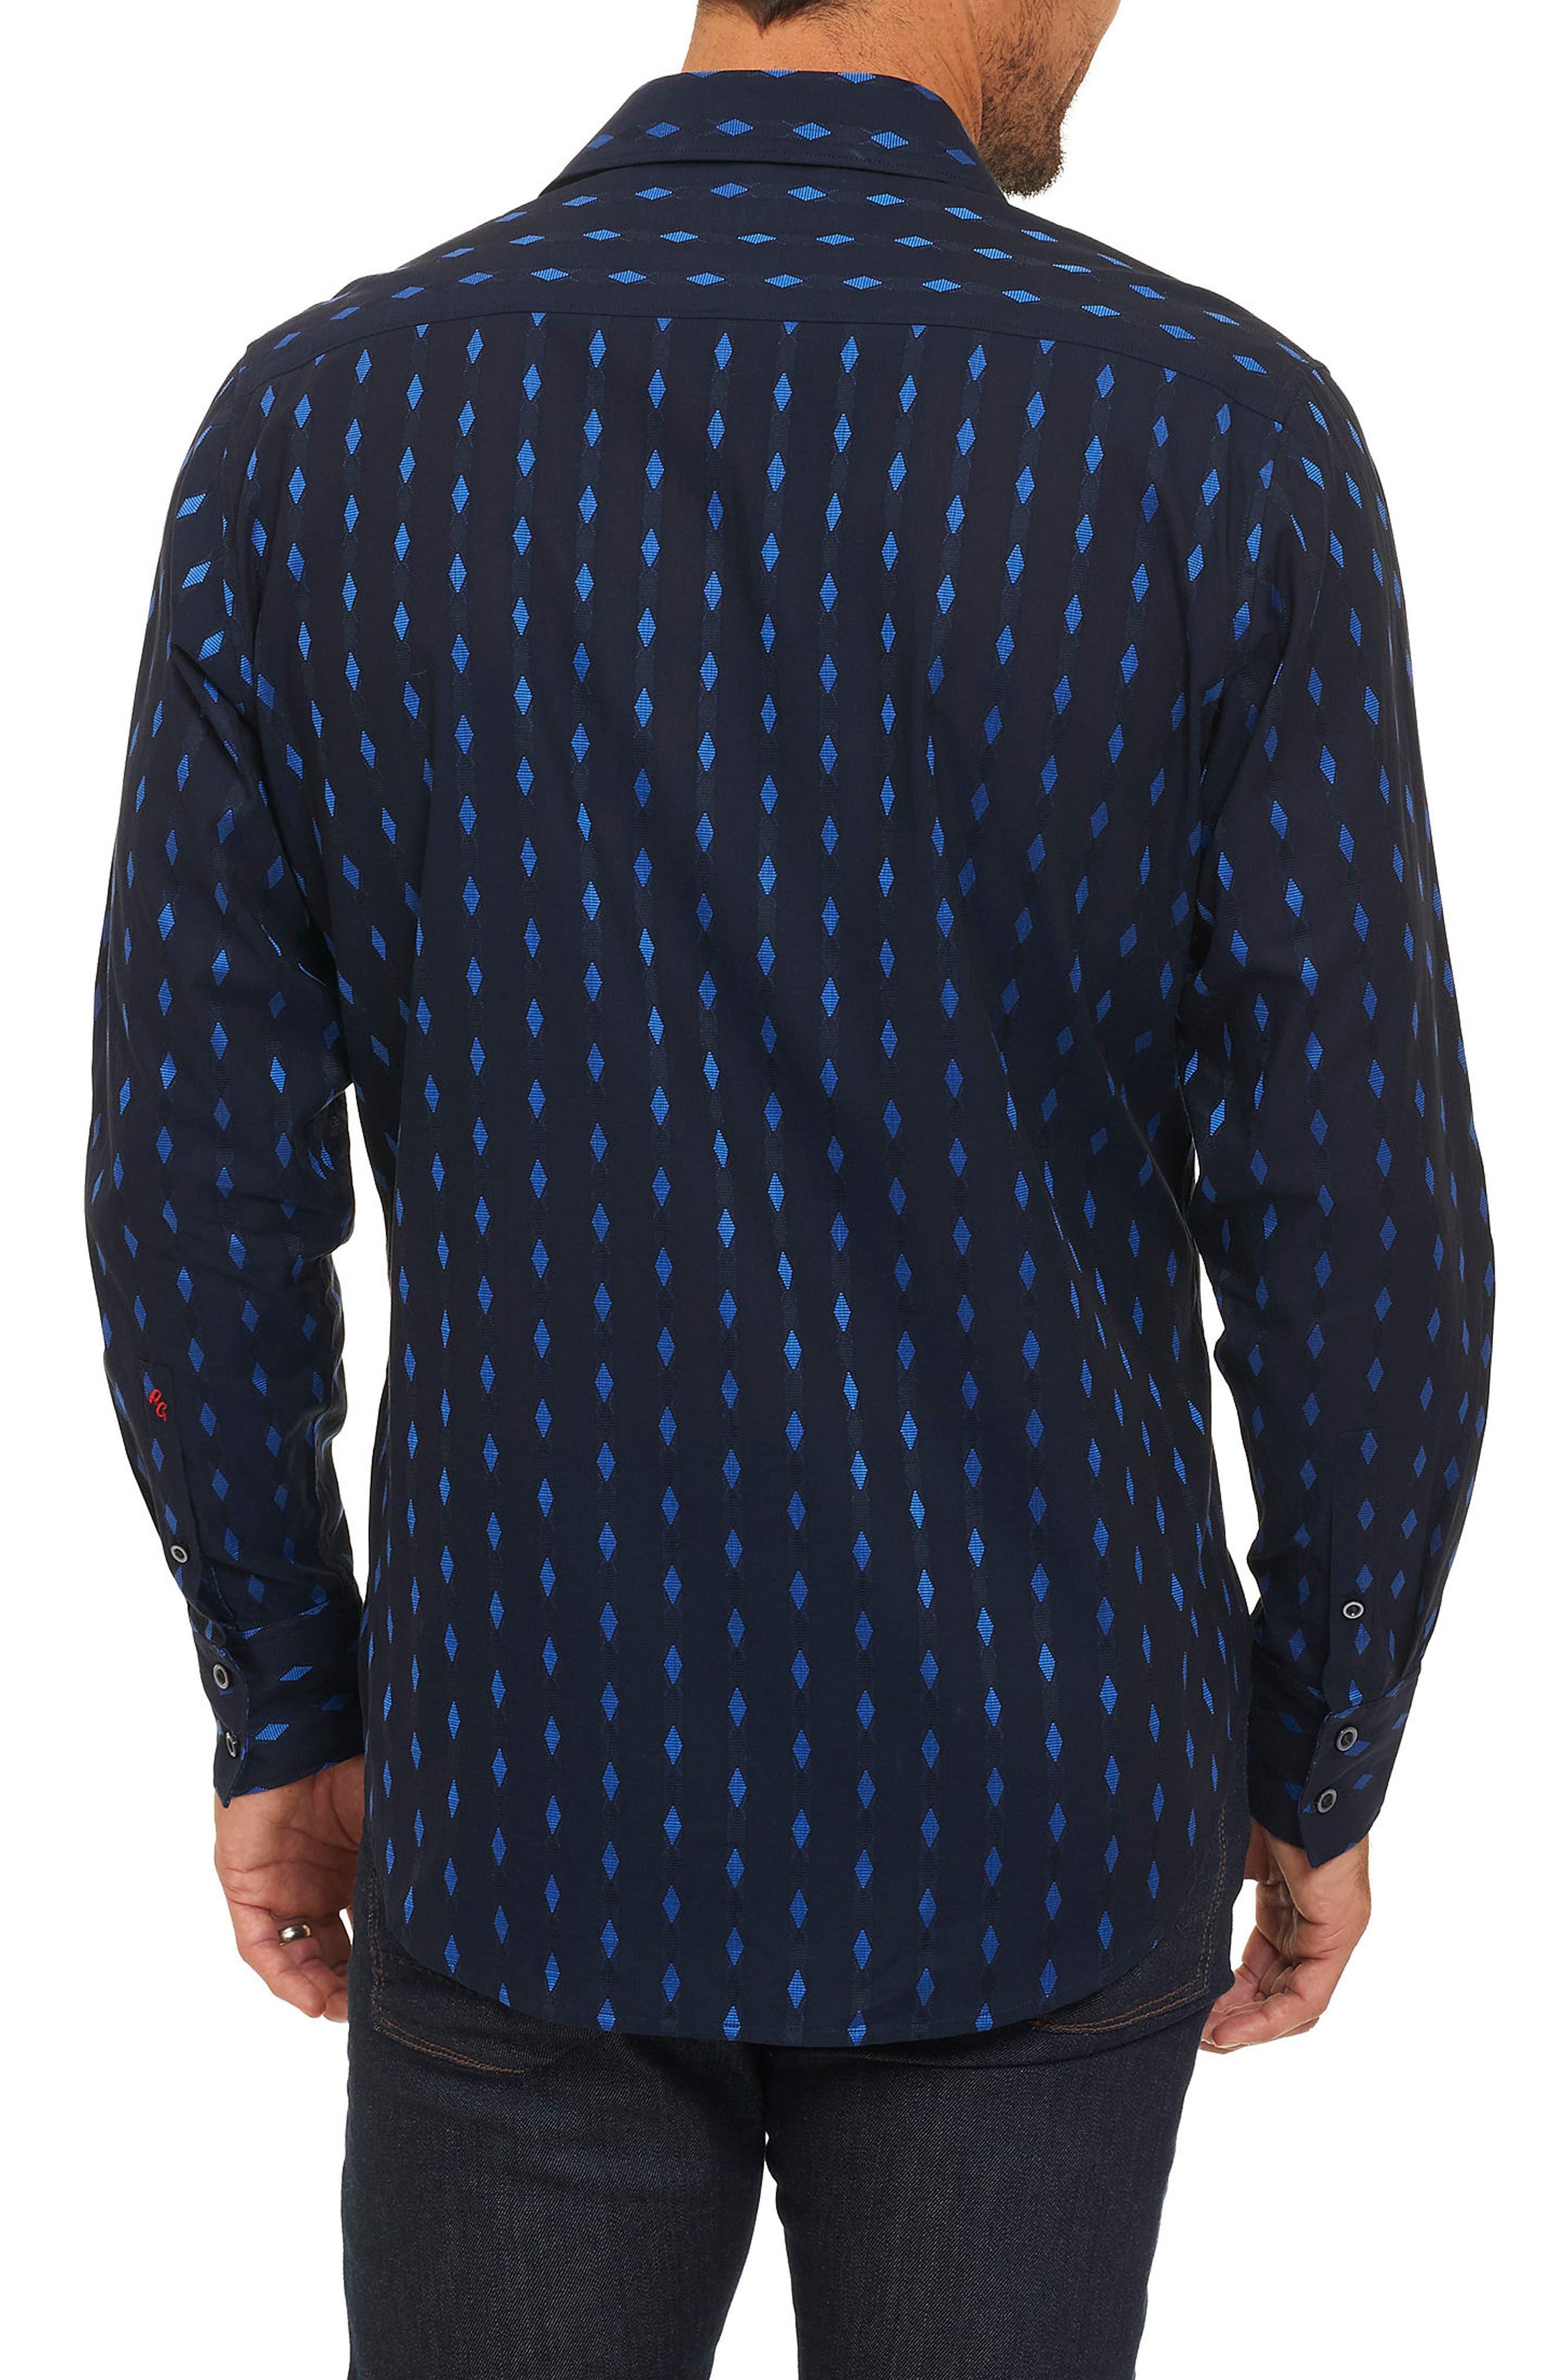 Kumar Sport Shirt,                             Alternate thumbnail 2, color,                             400